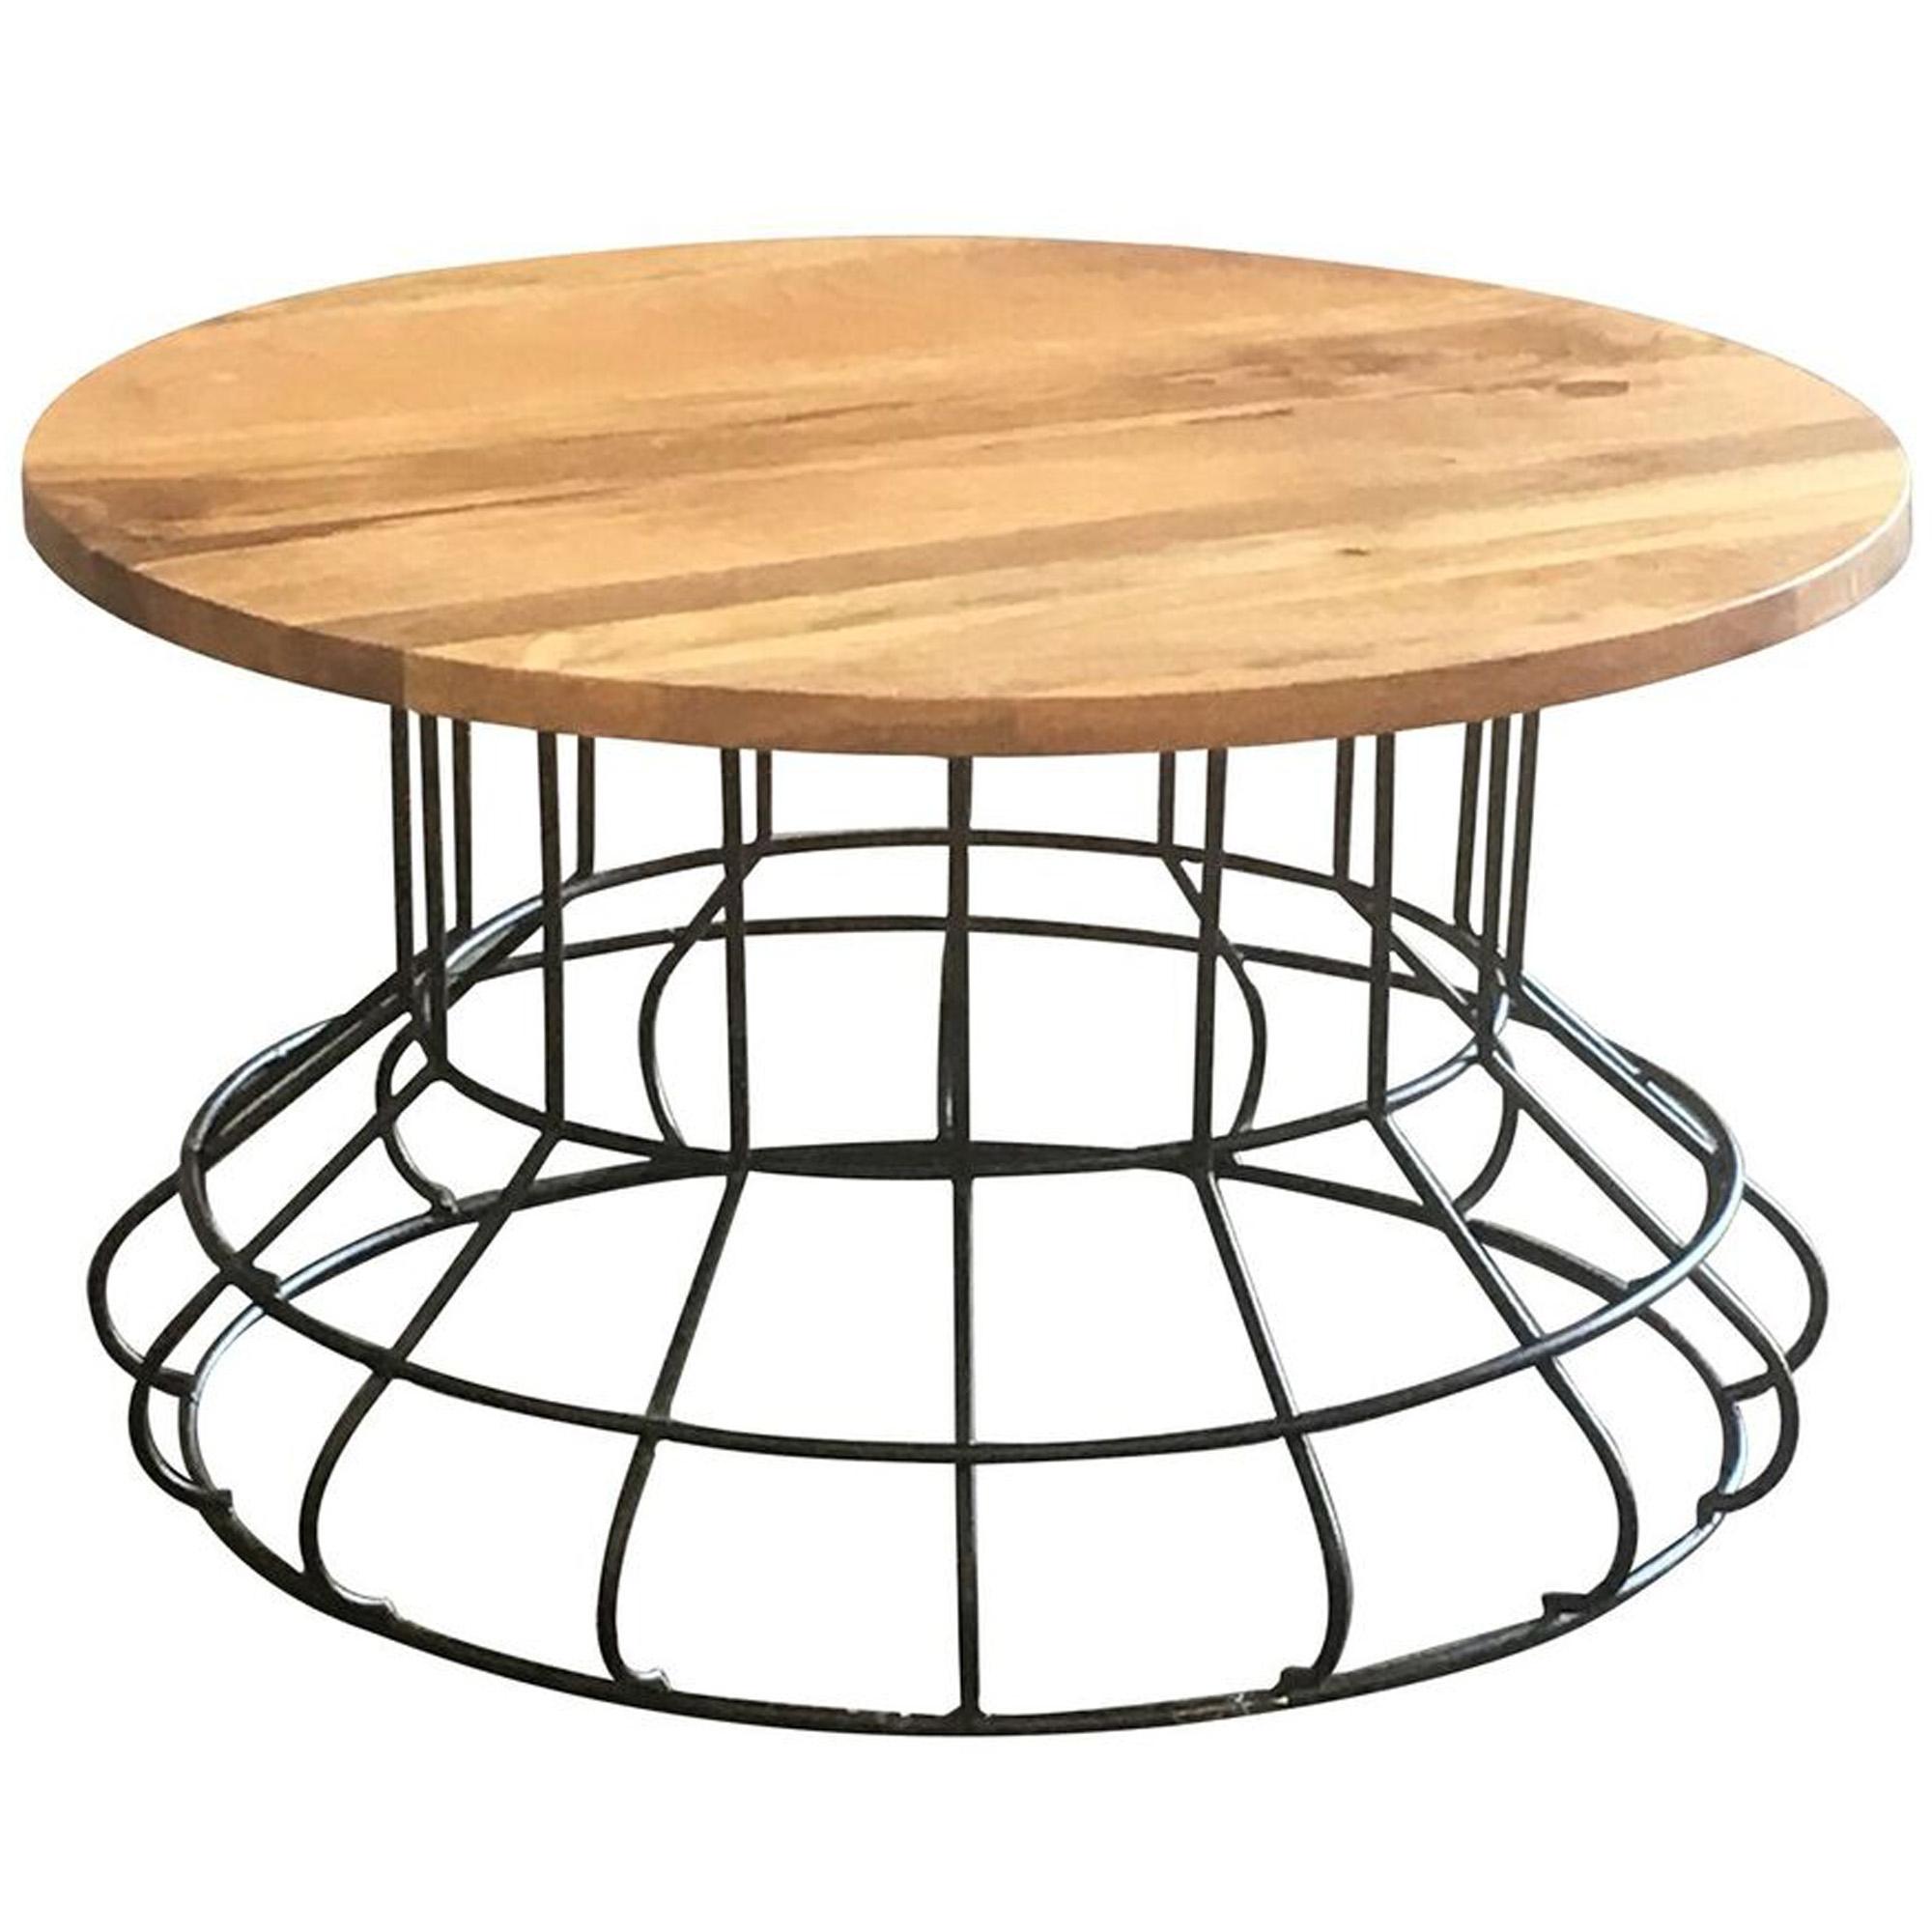 Ravi Industrial Coffee Table Industrial Coffee Table Indian